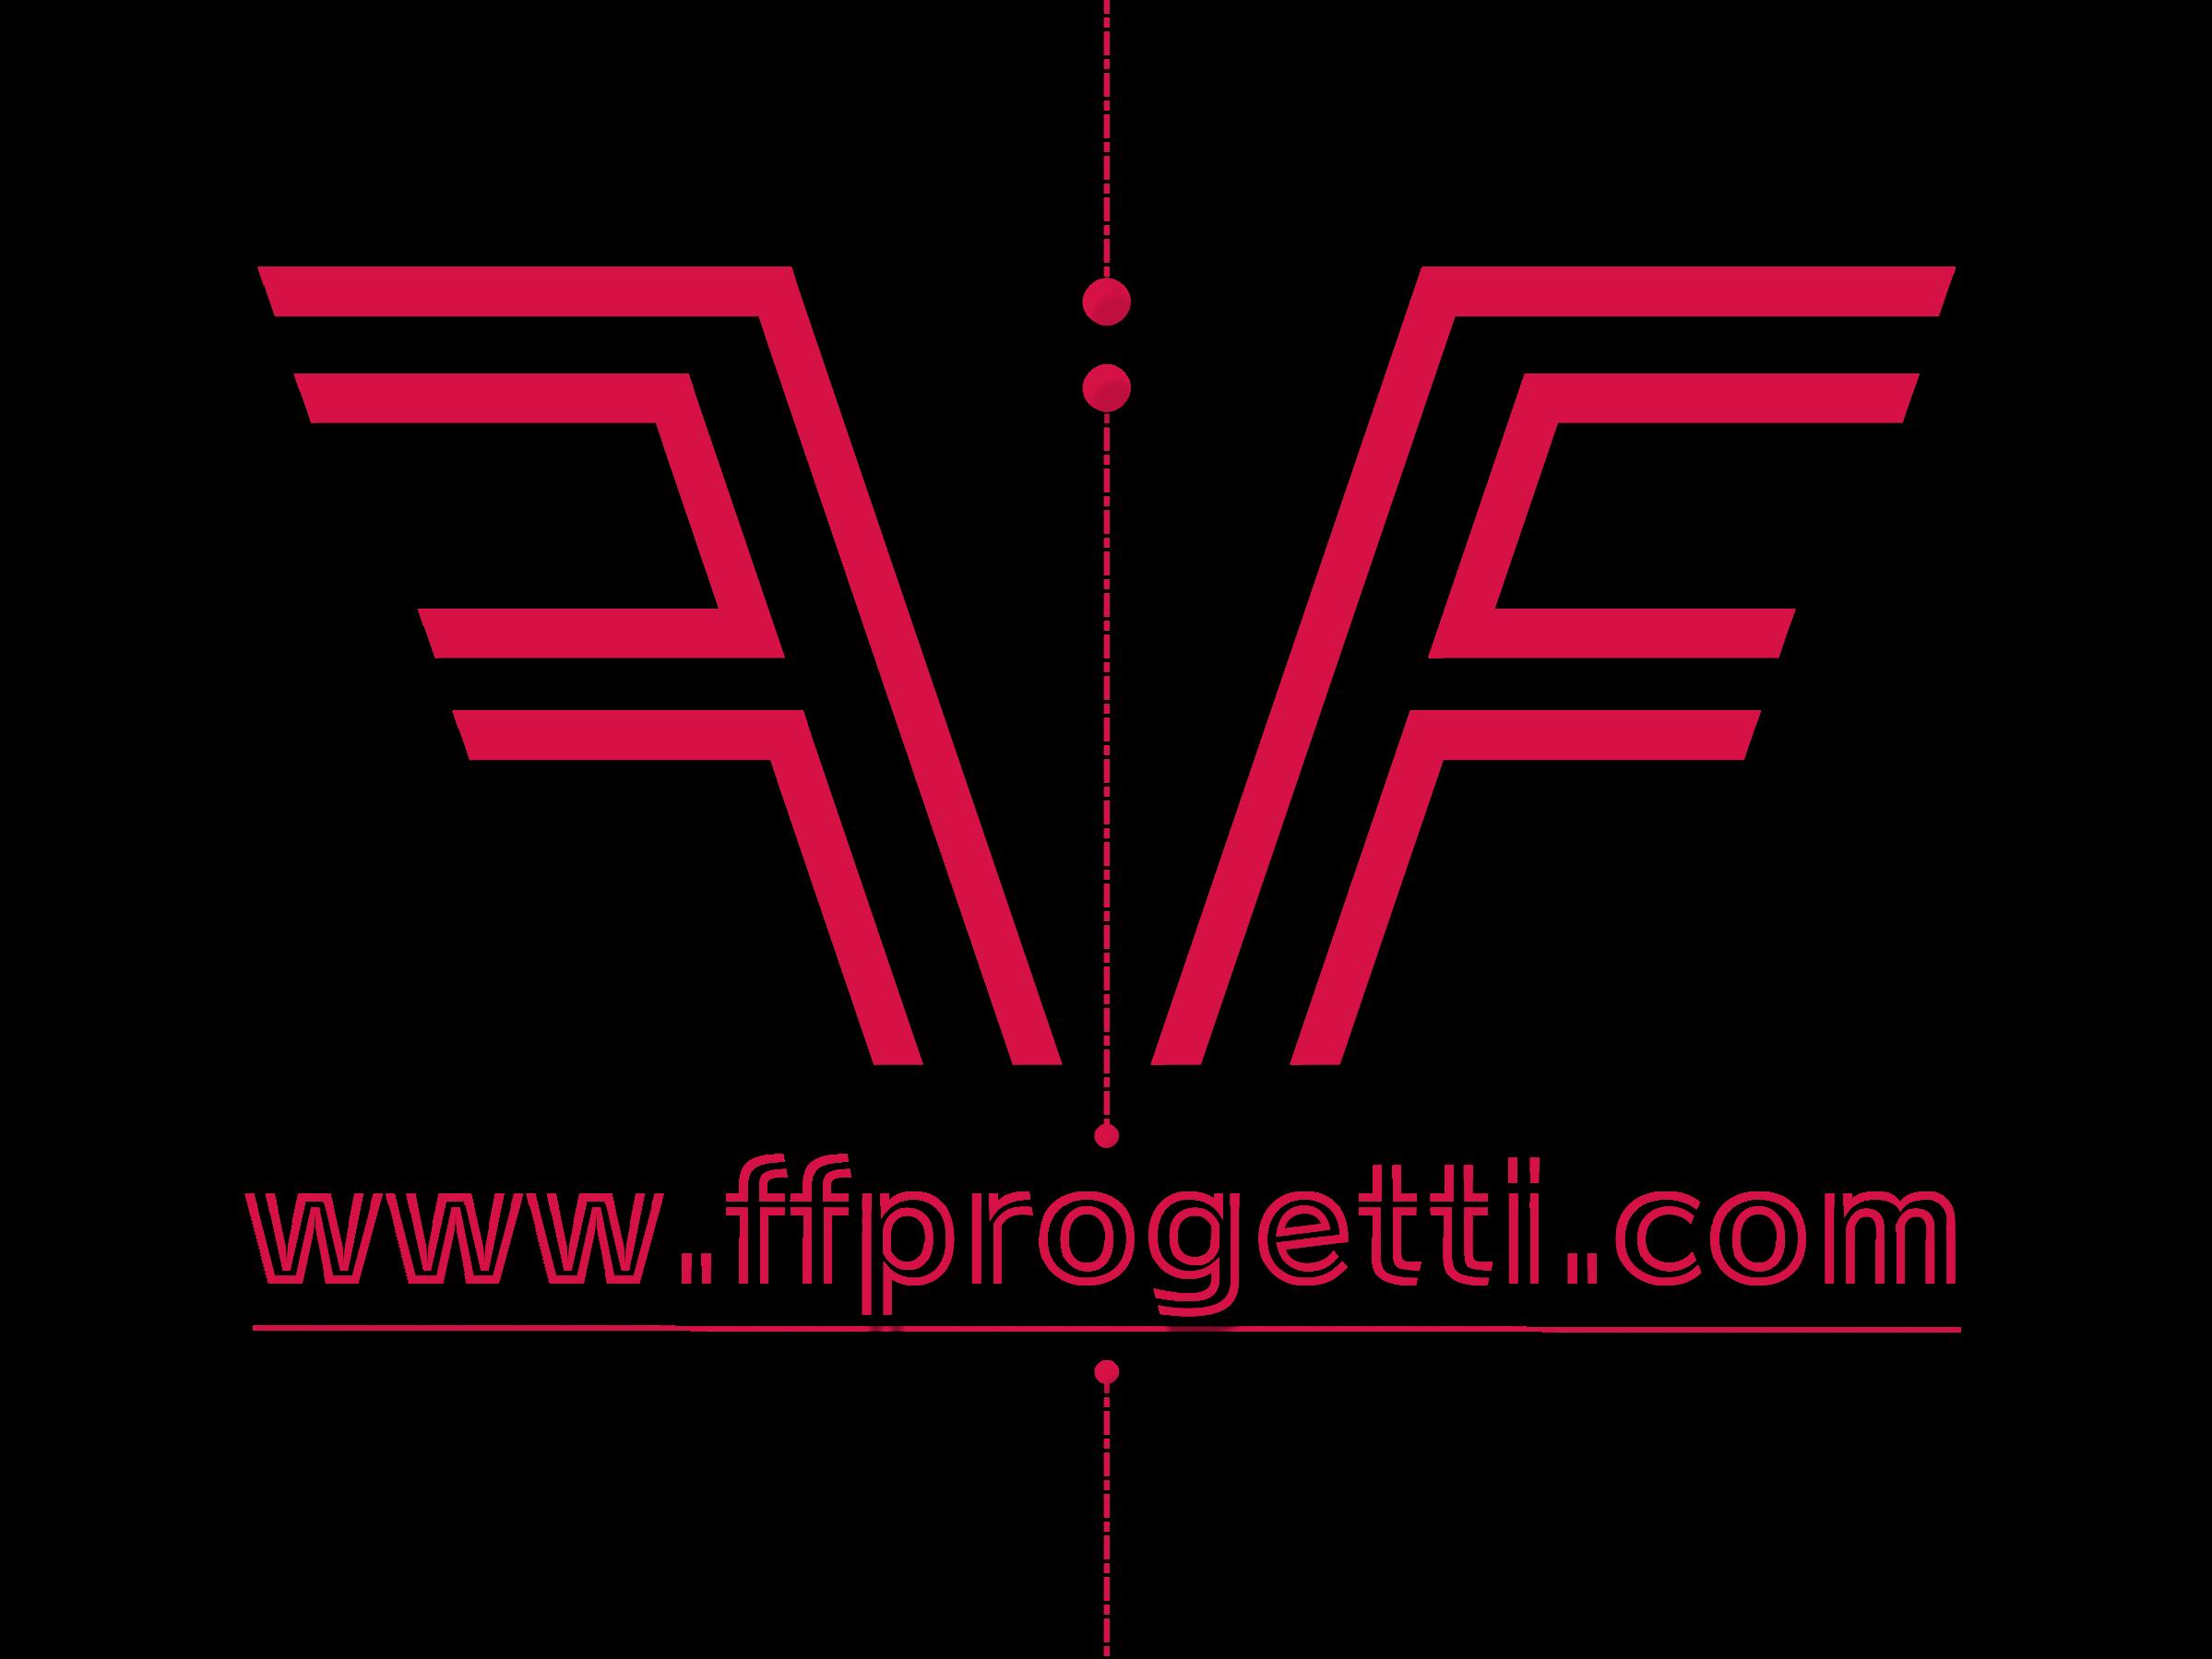 www.ffprogetti.com